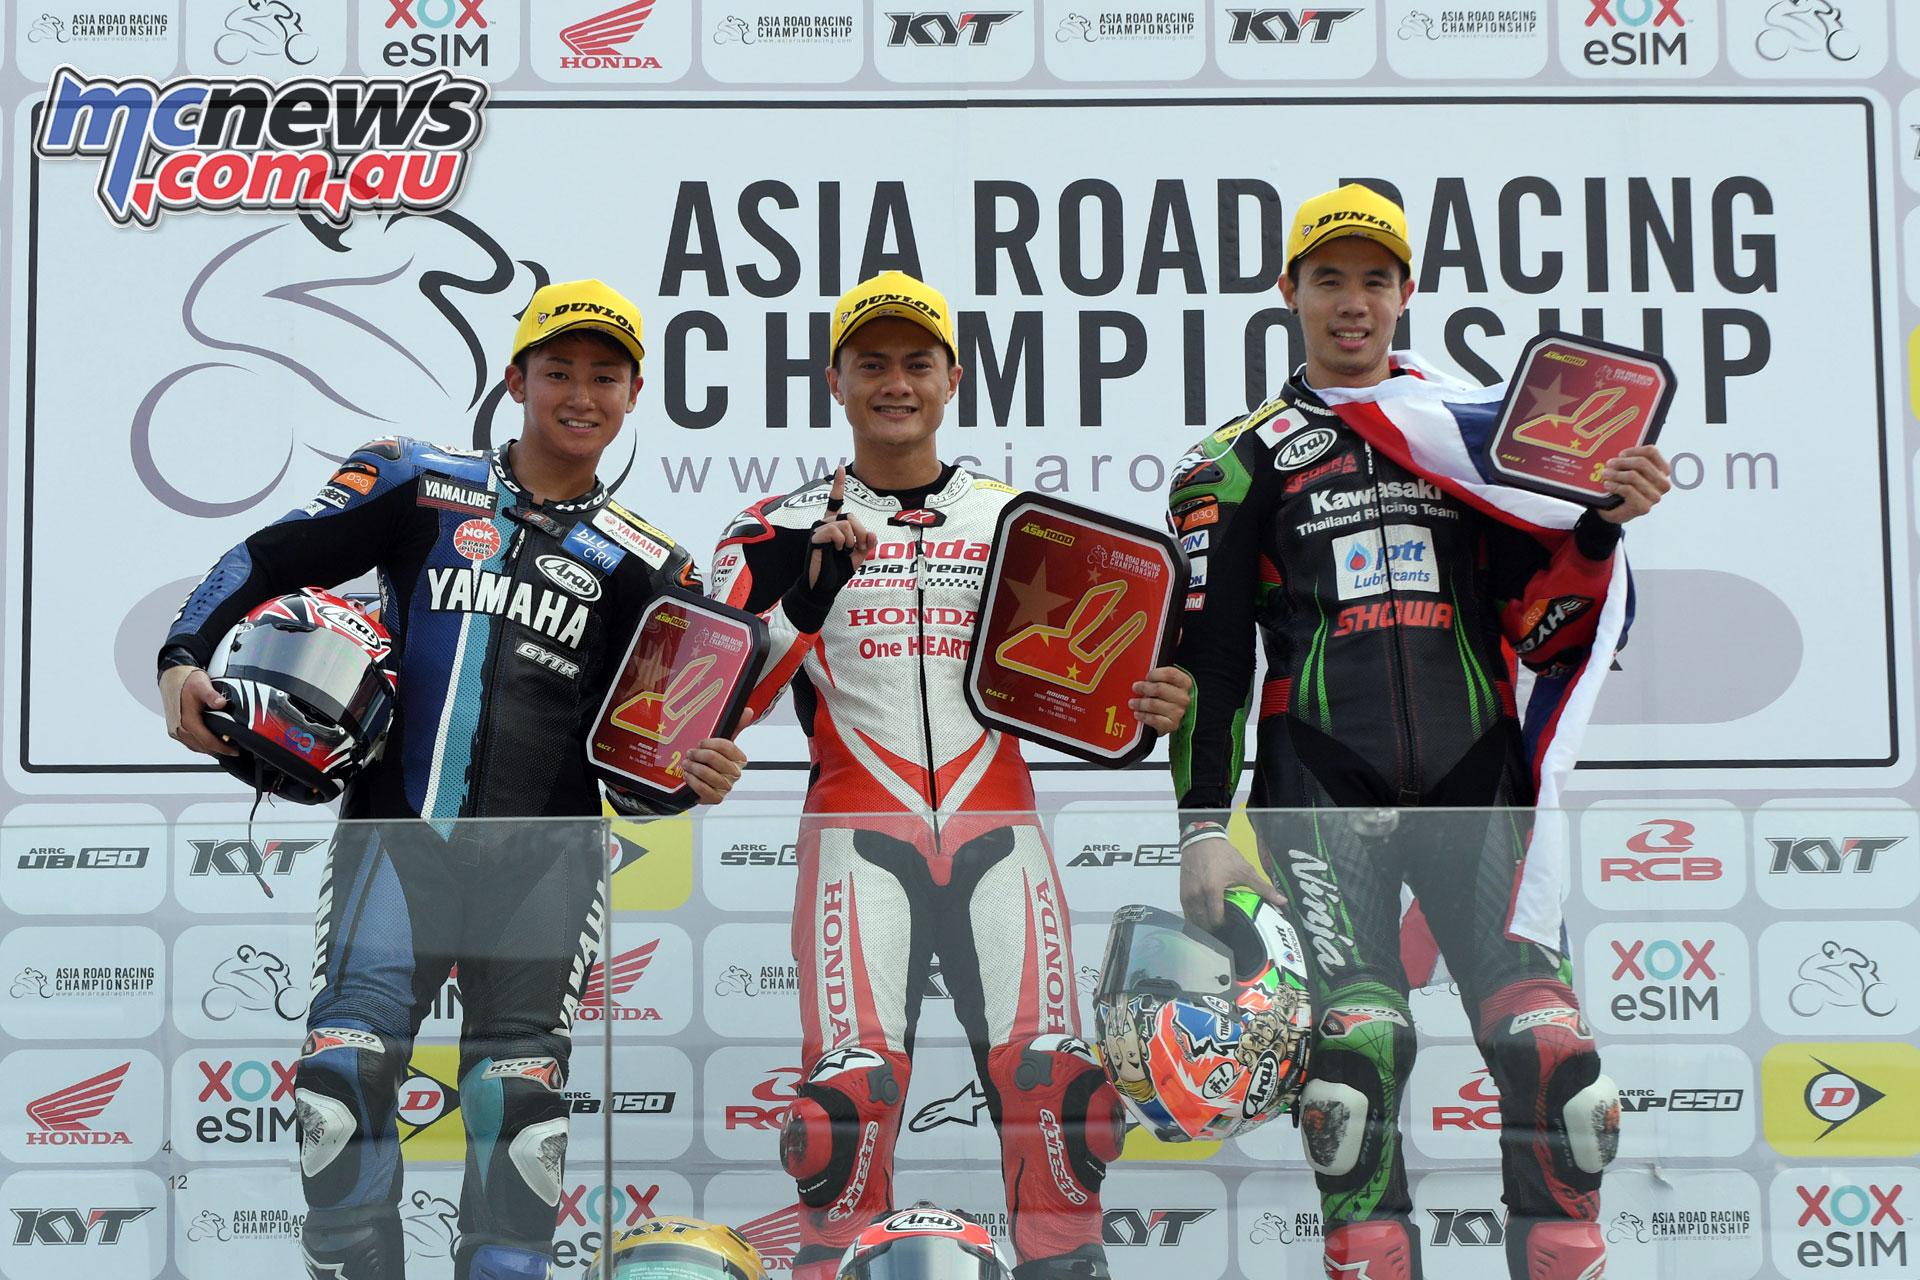 ARRC Round China ASB Race Podium